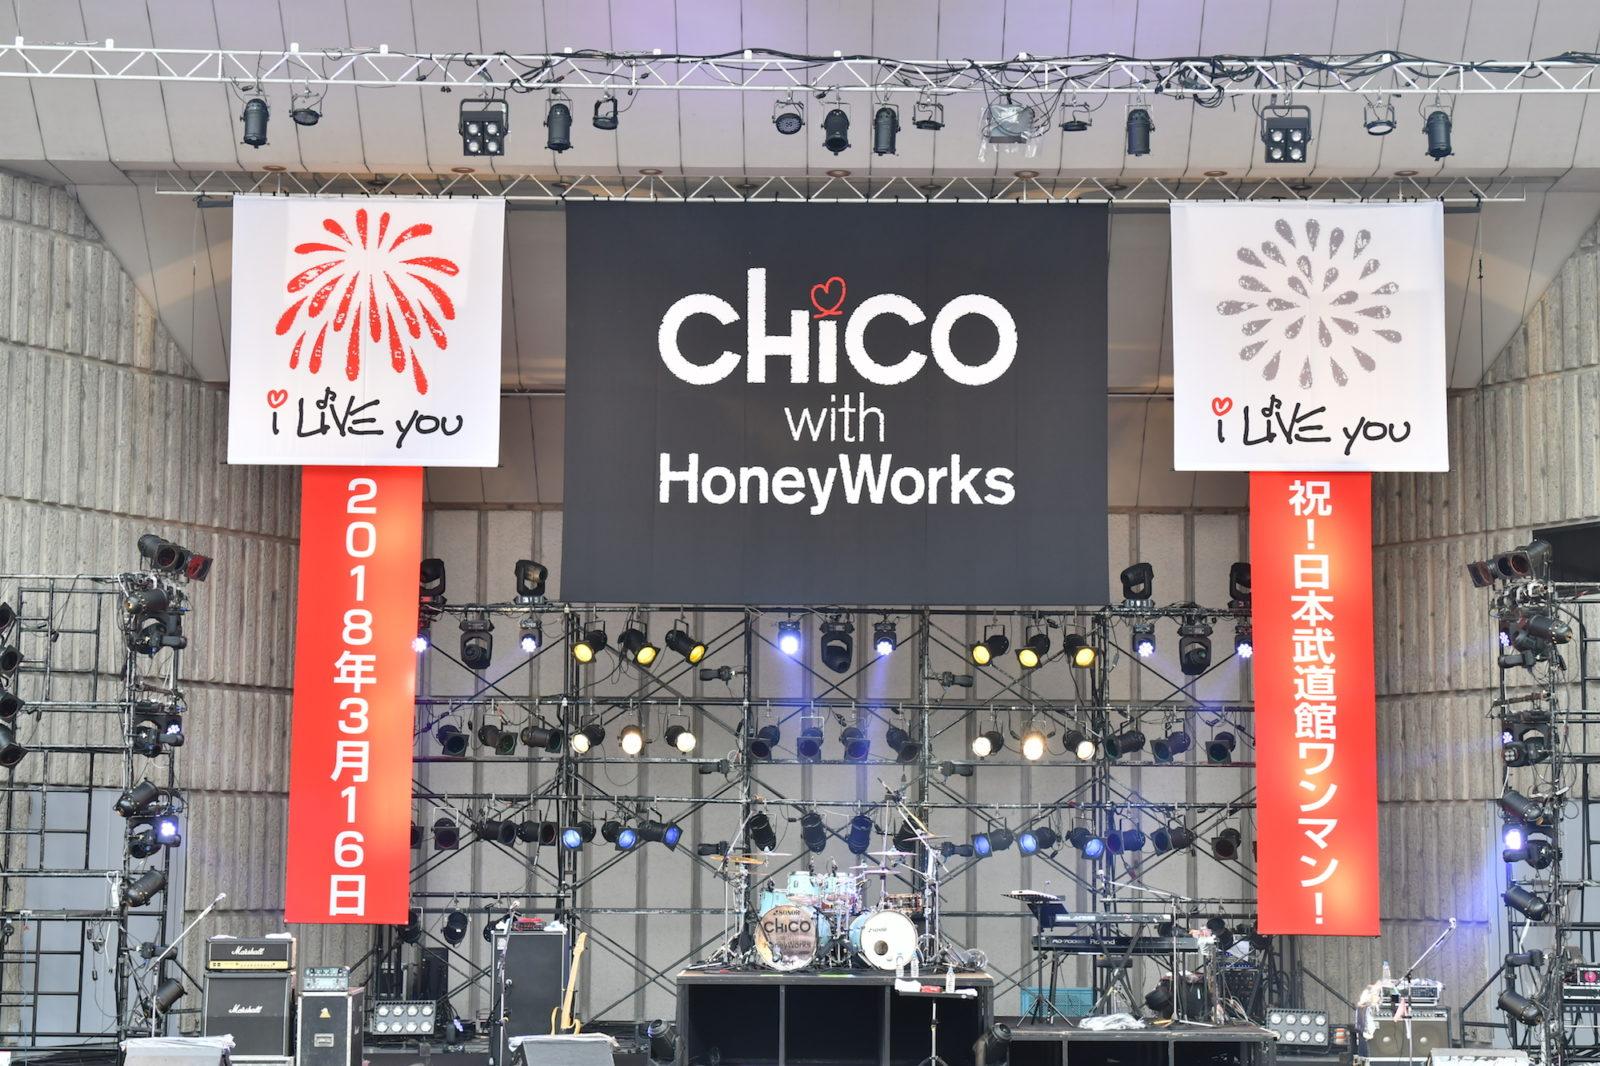 CHiCO with HoneyWorks、来春に初の日本武道館ワンマンライブ開催を発表!サプライズ満載のツアー・ファイナル日比谷野音公演も大盛況にて終幕サムネイル画像